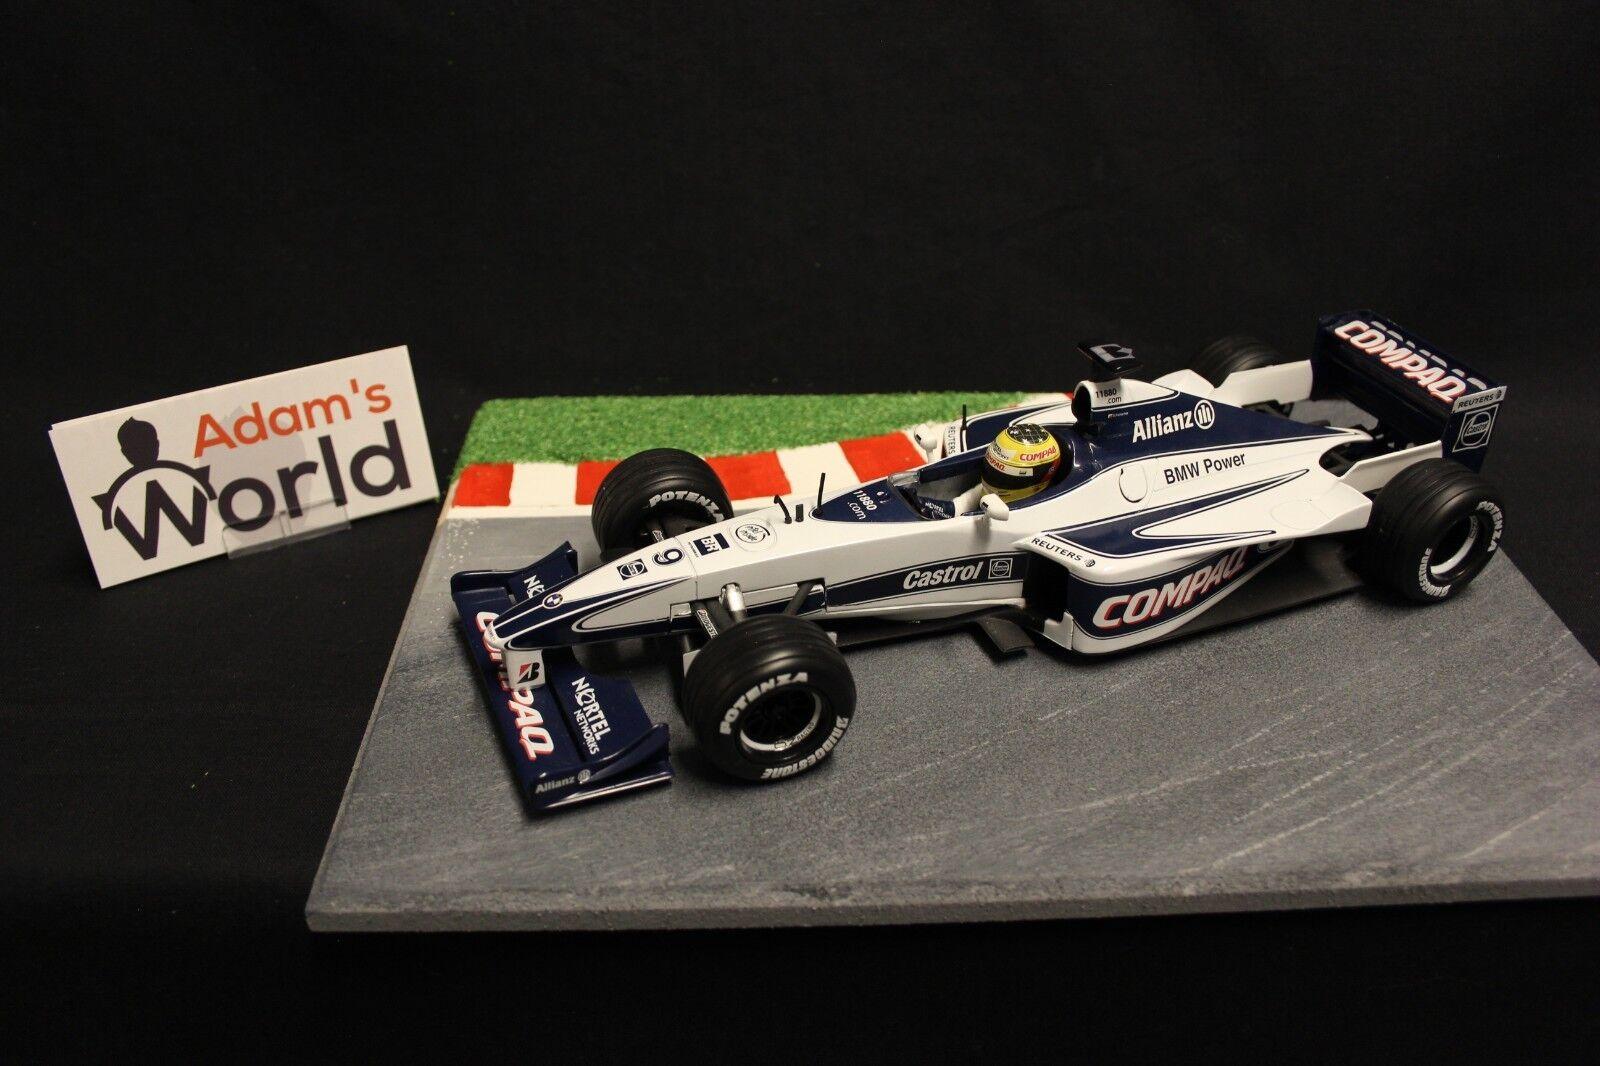 Hot Wheels Williams BMW FW22 2018  9 Ralf Schumacher (GER) (F1NB)